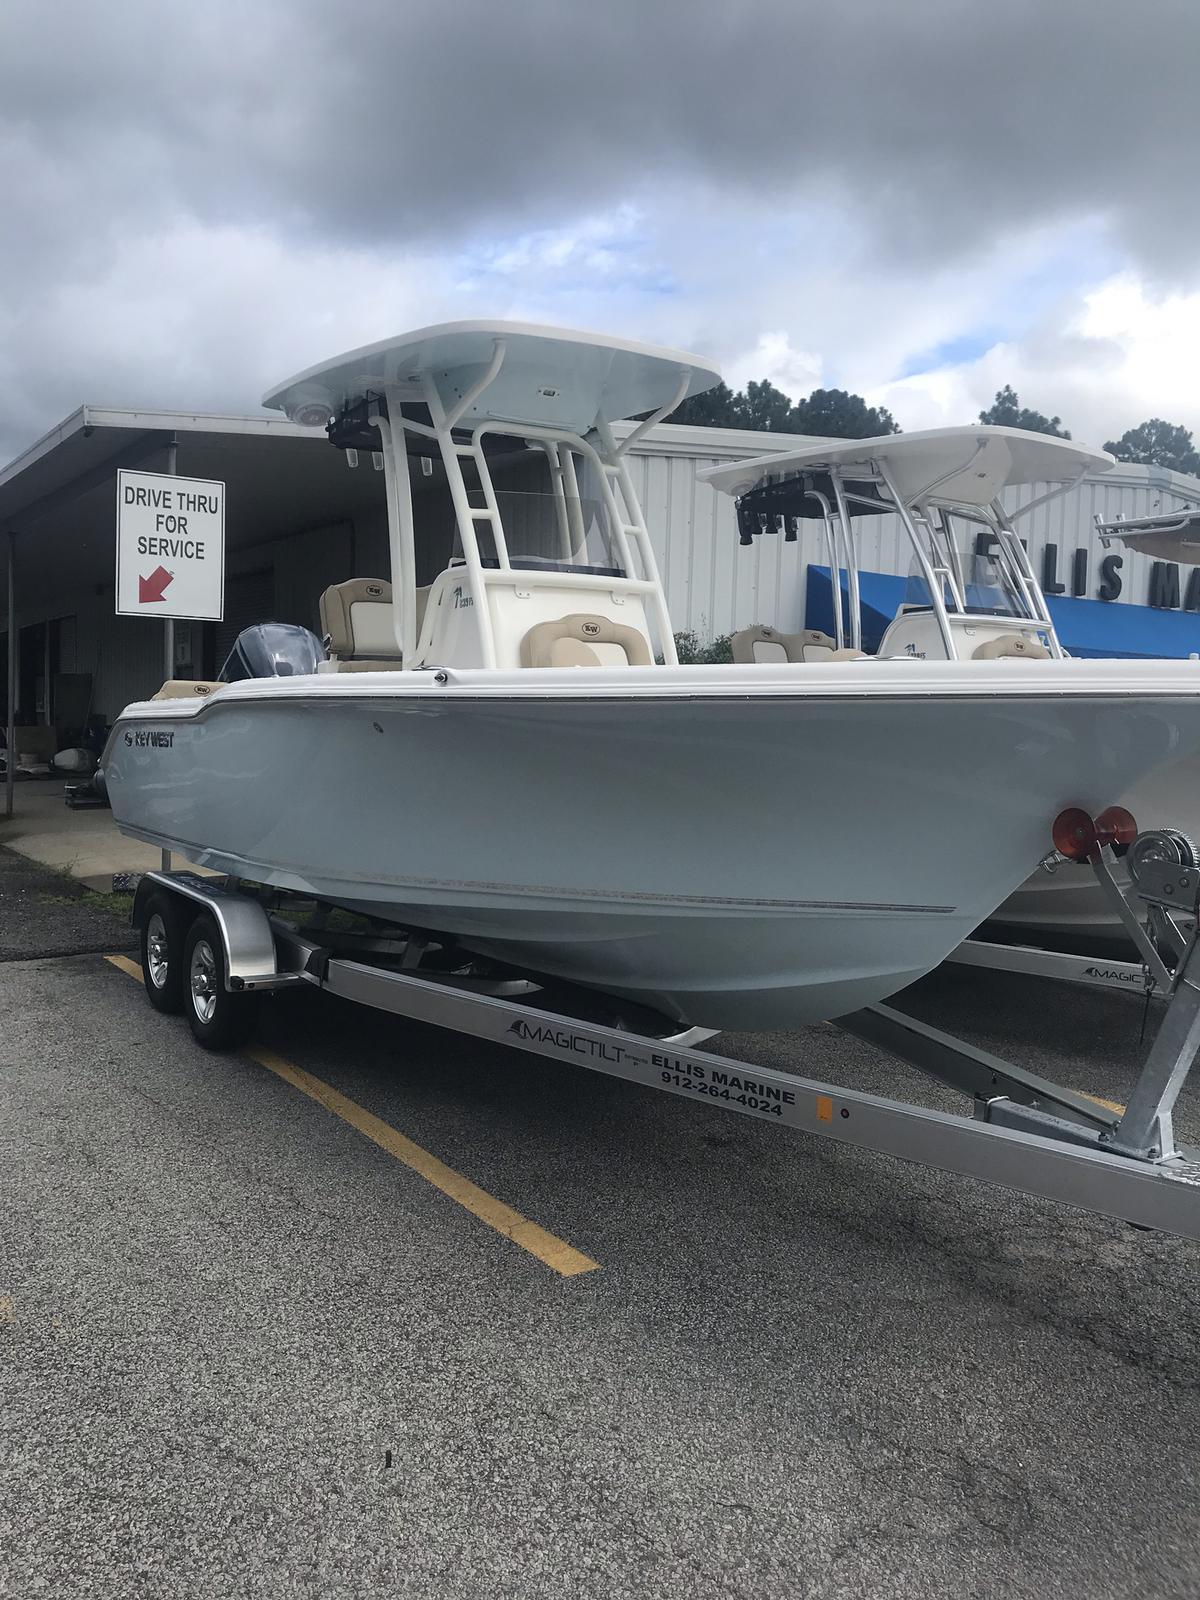 Inventory Ellis Marine Brunswick, GA (912) 264-4024